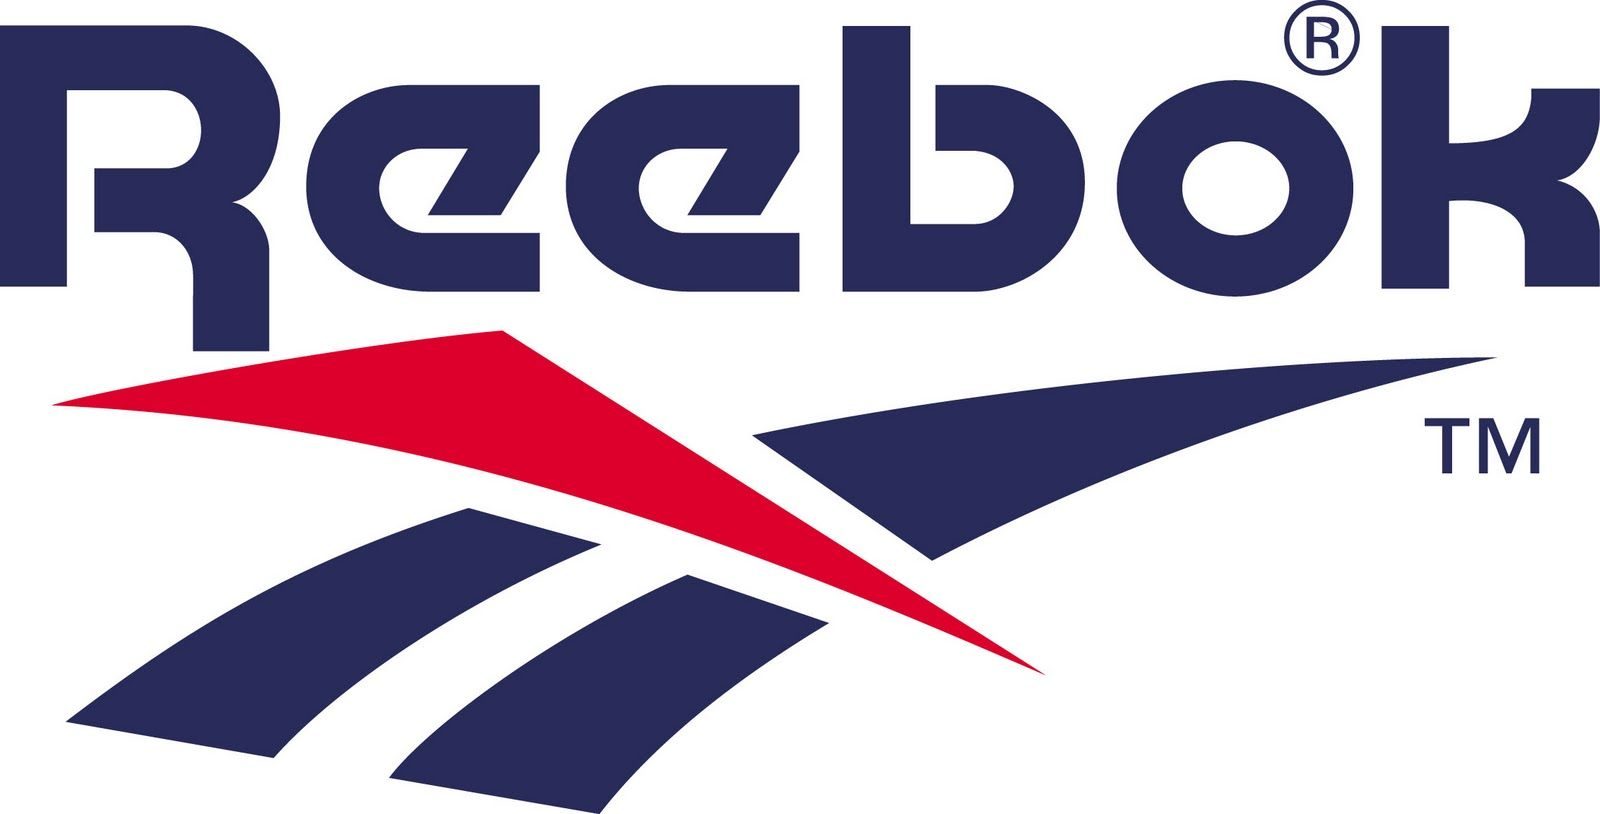 Reebok in Logos Wugange. Logos de marcas, Lenguaje de